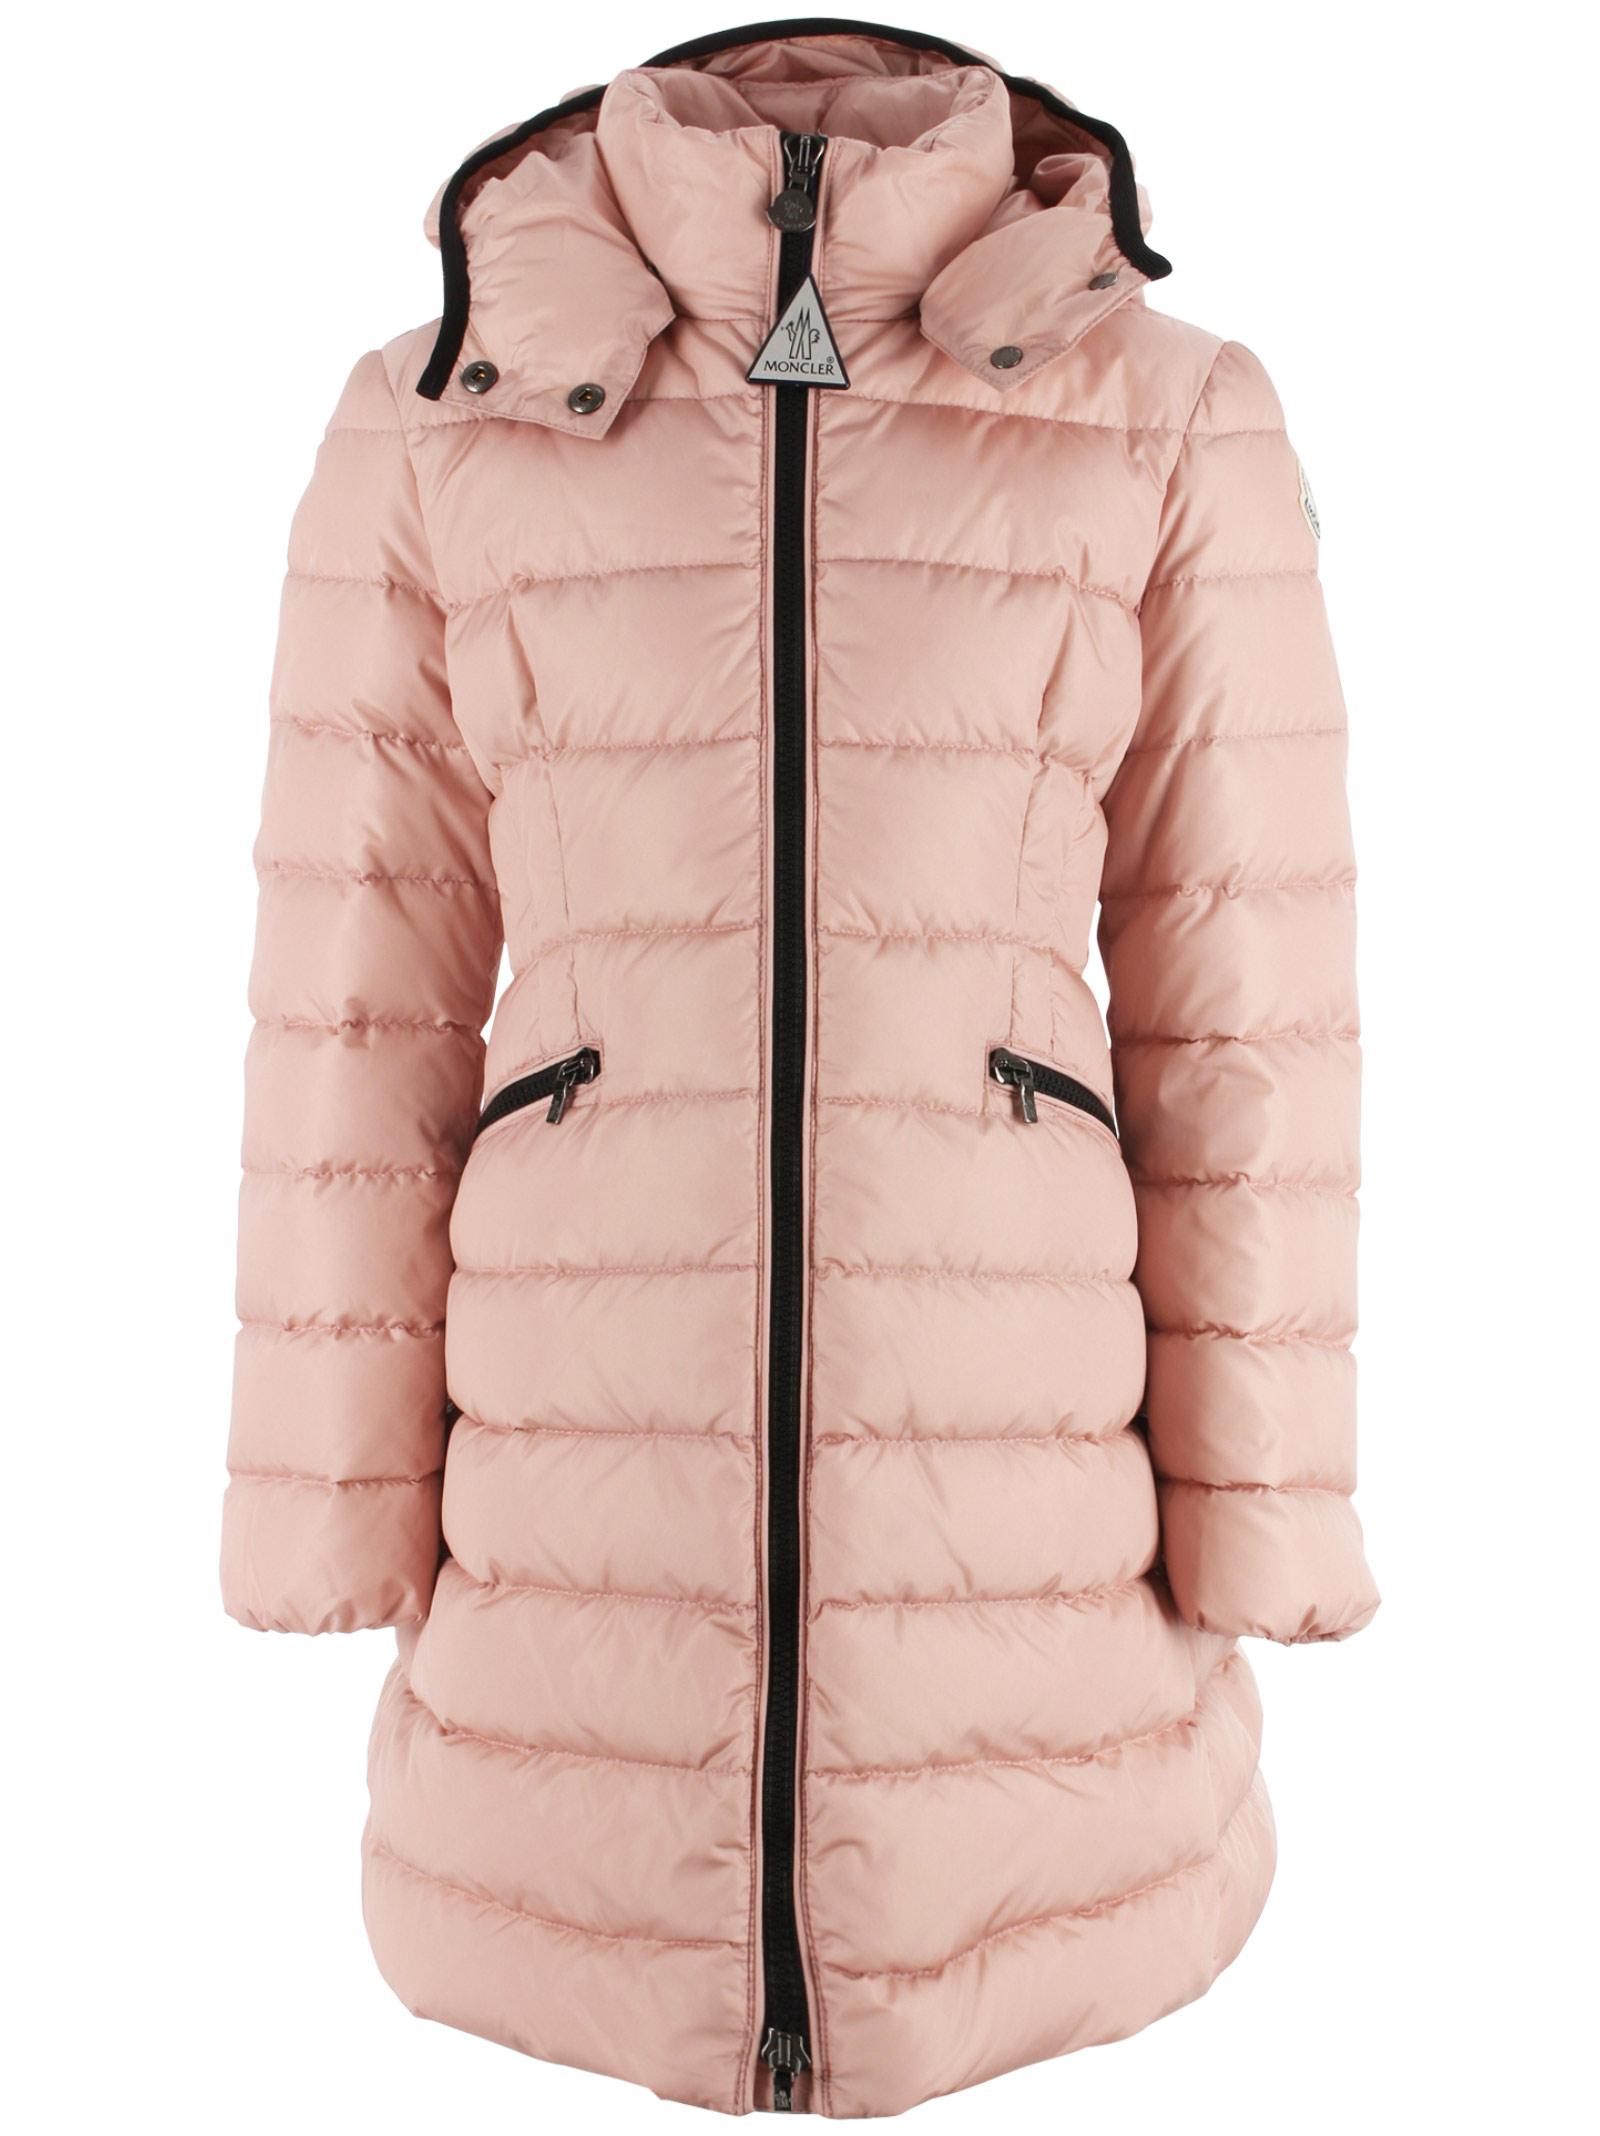 006288c97 Moncler Kids jacket - Moncler Kids - Michele Franzese Moda